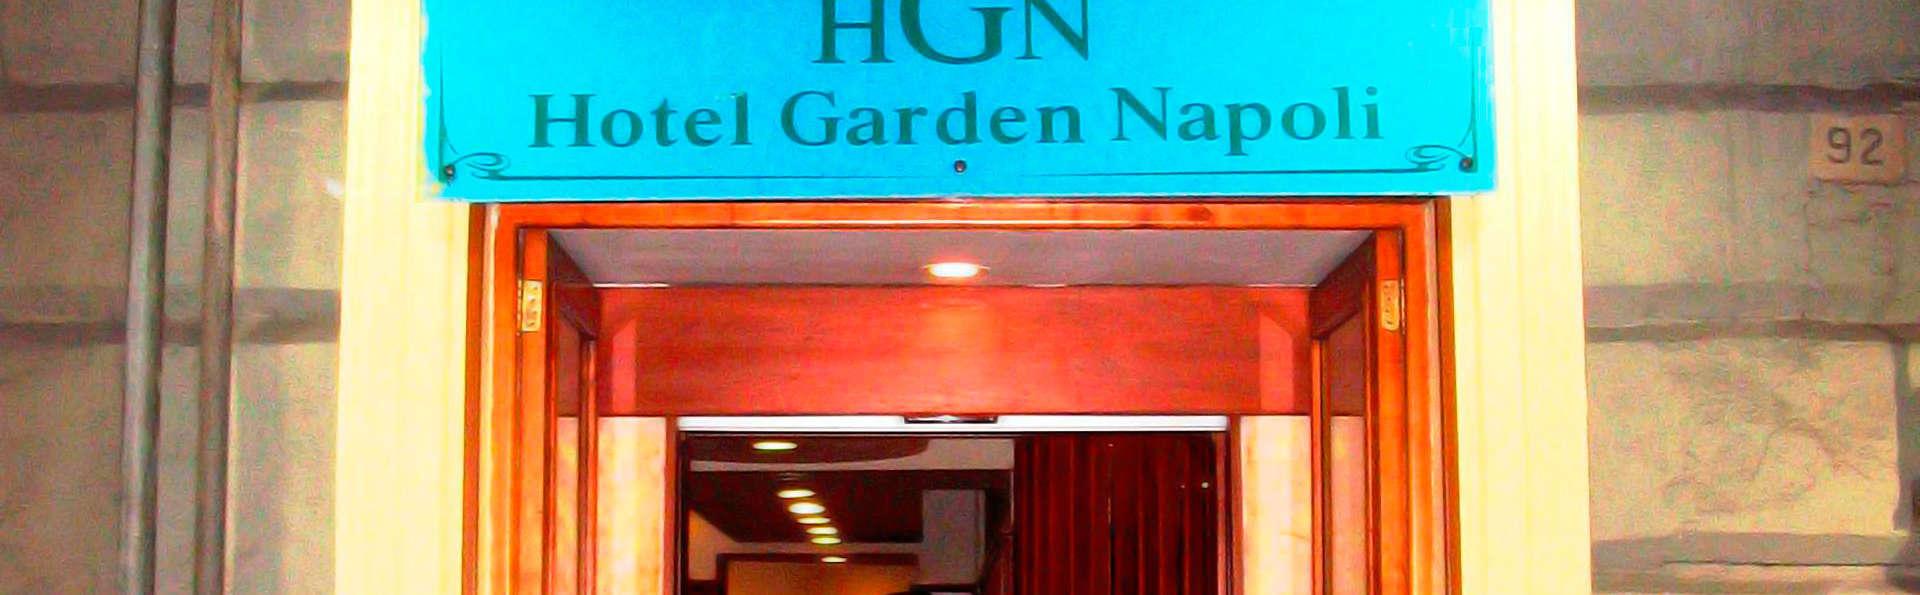 Hotel Garden Napoli - edit_front321.jpg